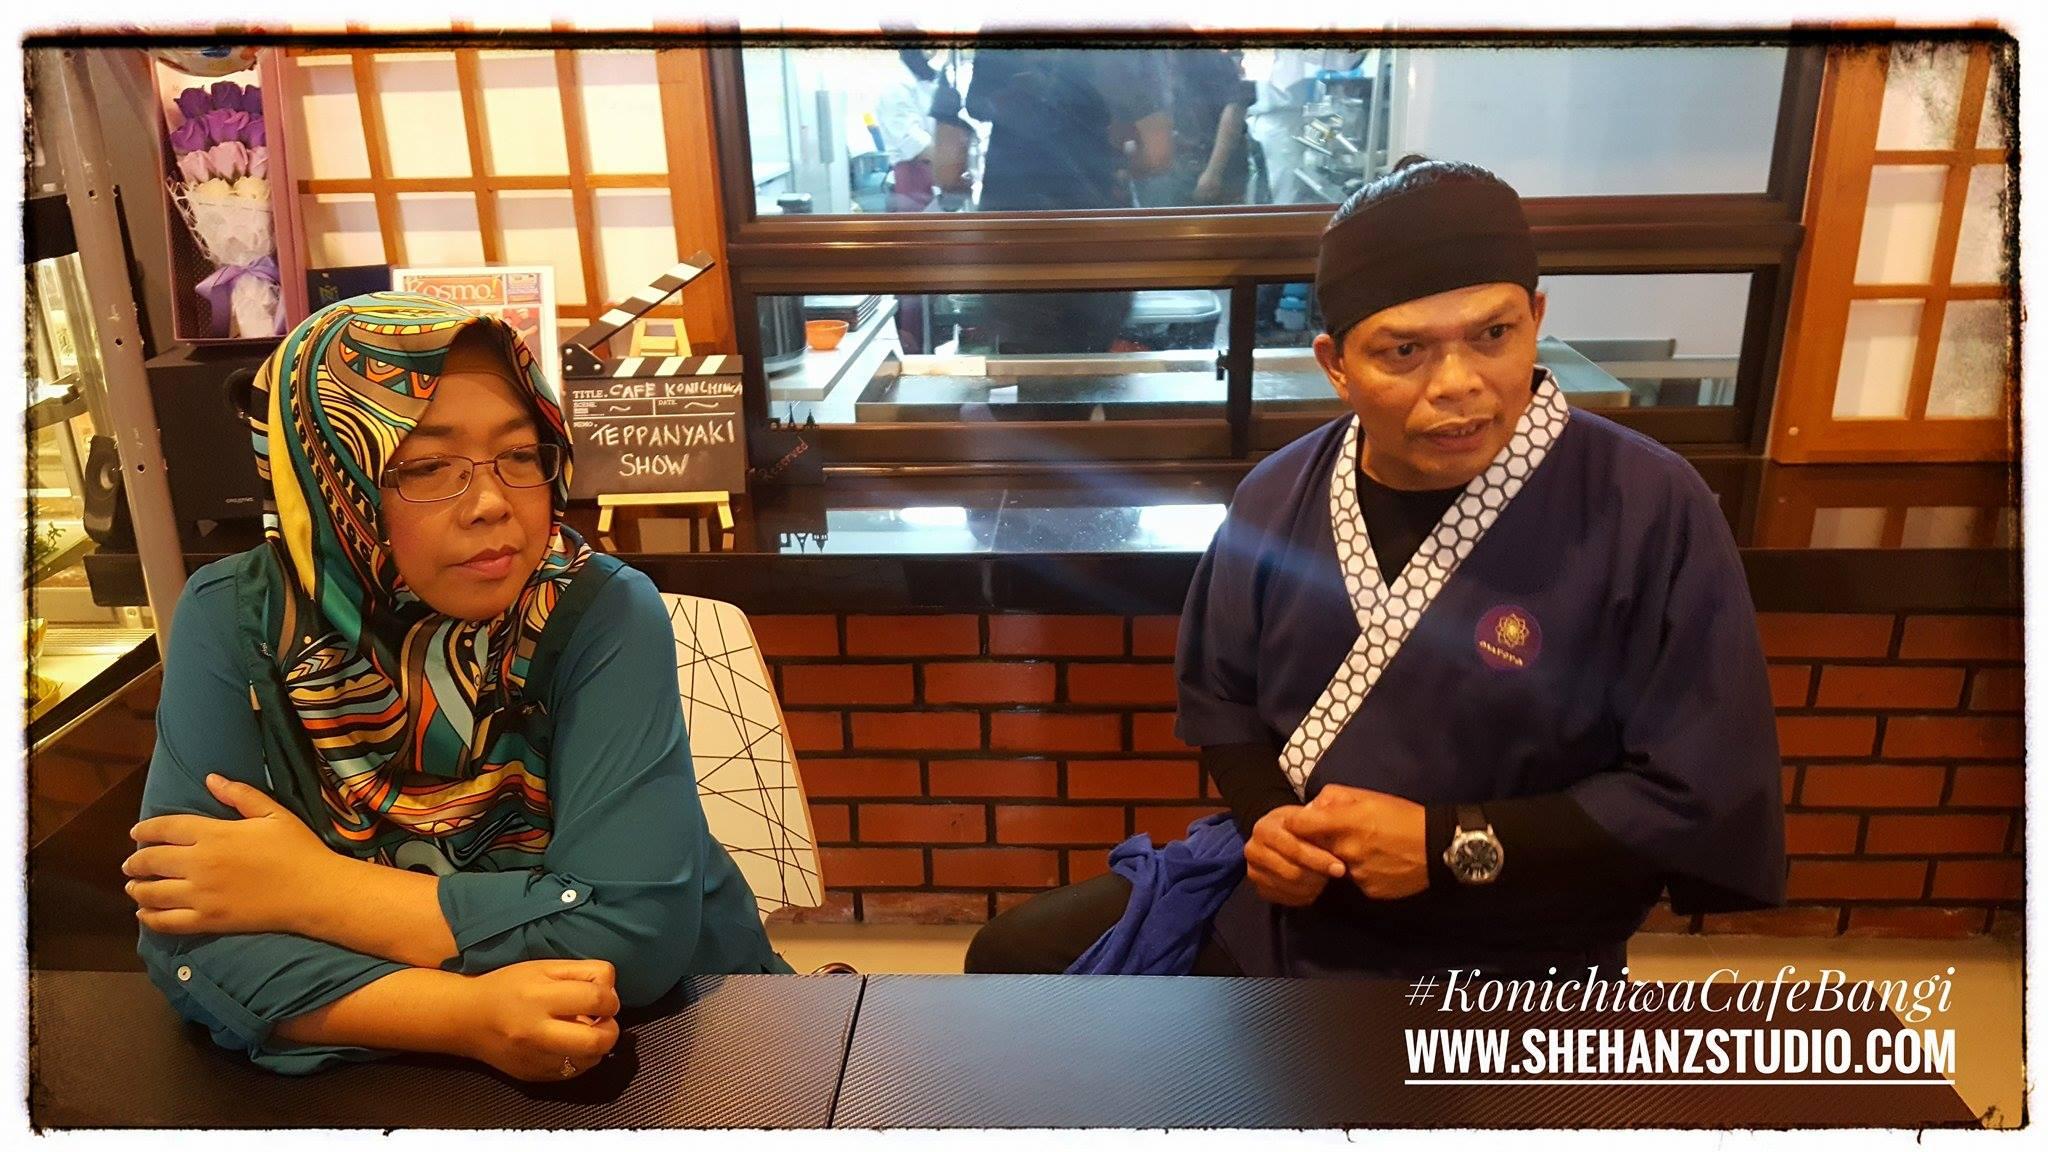 RESTORAN MAKANAN JEPUN HALAL DI BANGI - KONICHIWA CAFE (13)